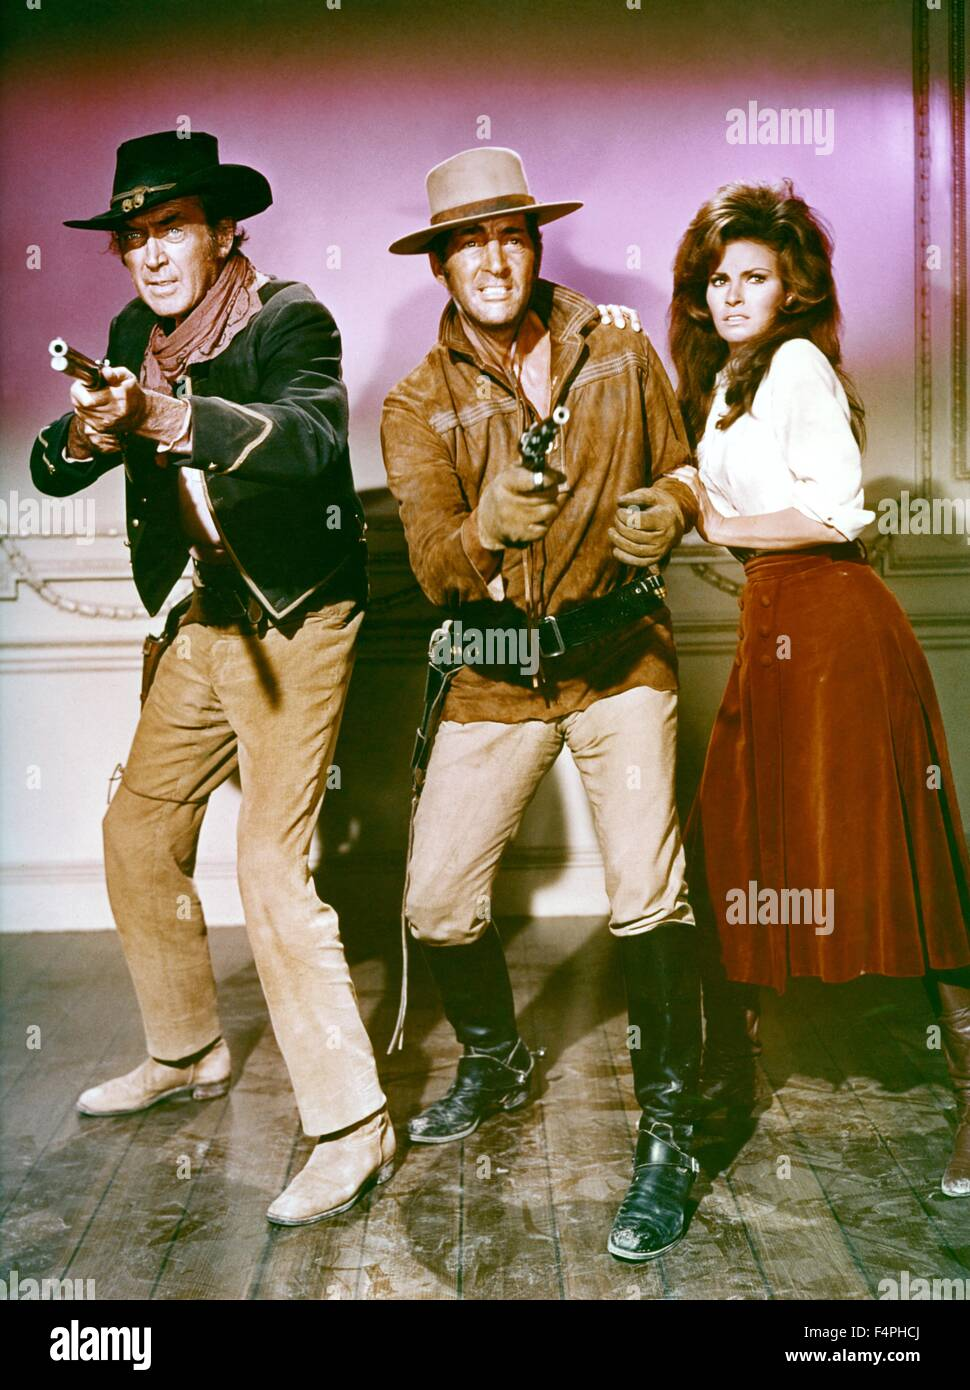 James Stewart, Dean Martin and Raquel Welch / Bandolero ! / 1968 directed by Andrew V. McLaglen [20th Century Fox] - Stock Image